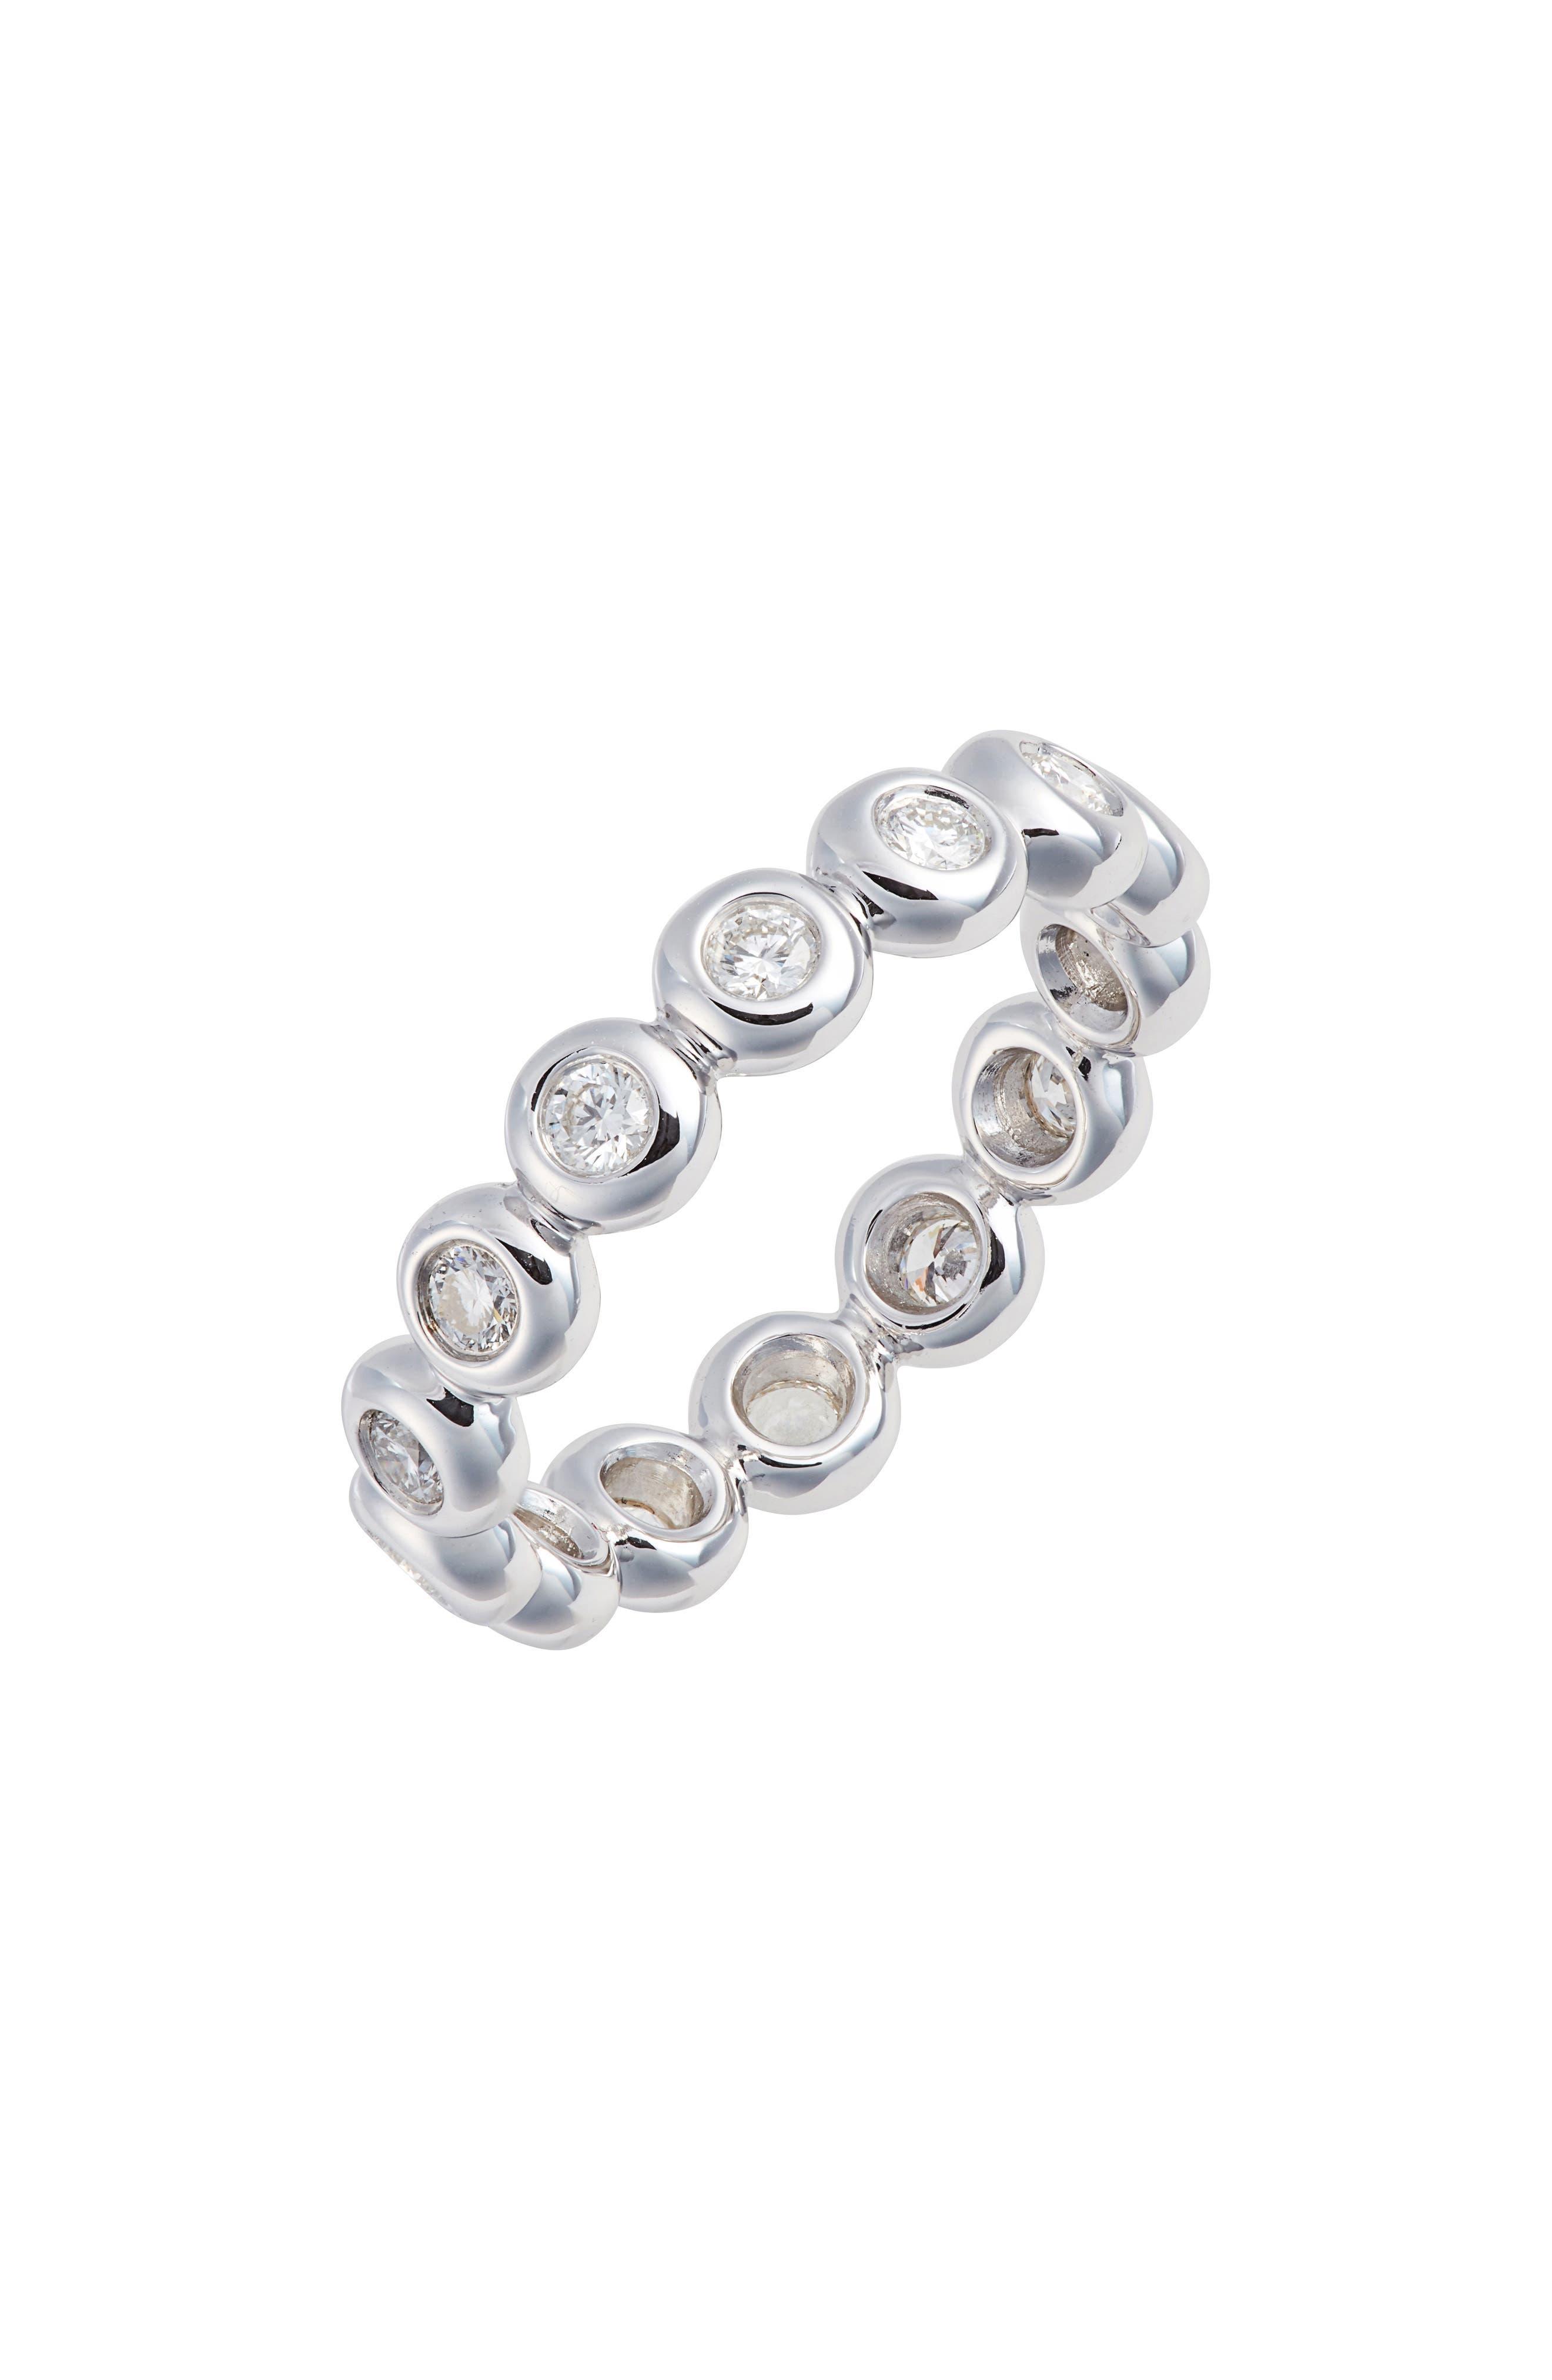 Monaco Bezel Diamond Stacking Ring,                             Main thumbnail 1, color,                             WHITE GOLD/ DIA